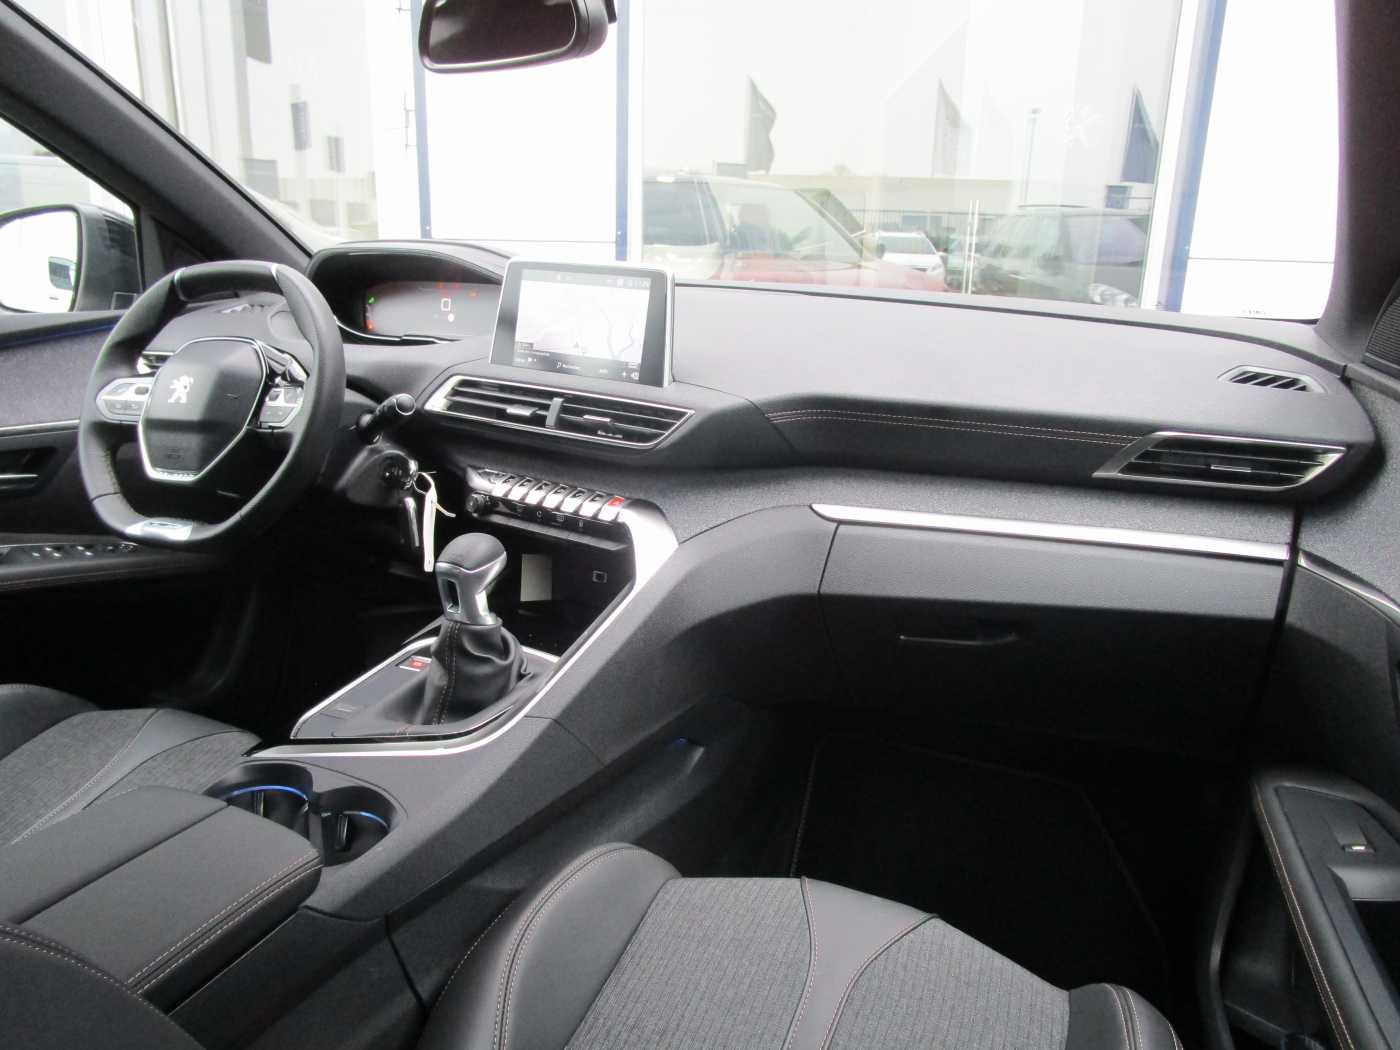 Peugeot 3008 1.2 PureTech GT Line (EU6.2) 2/12